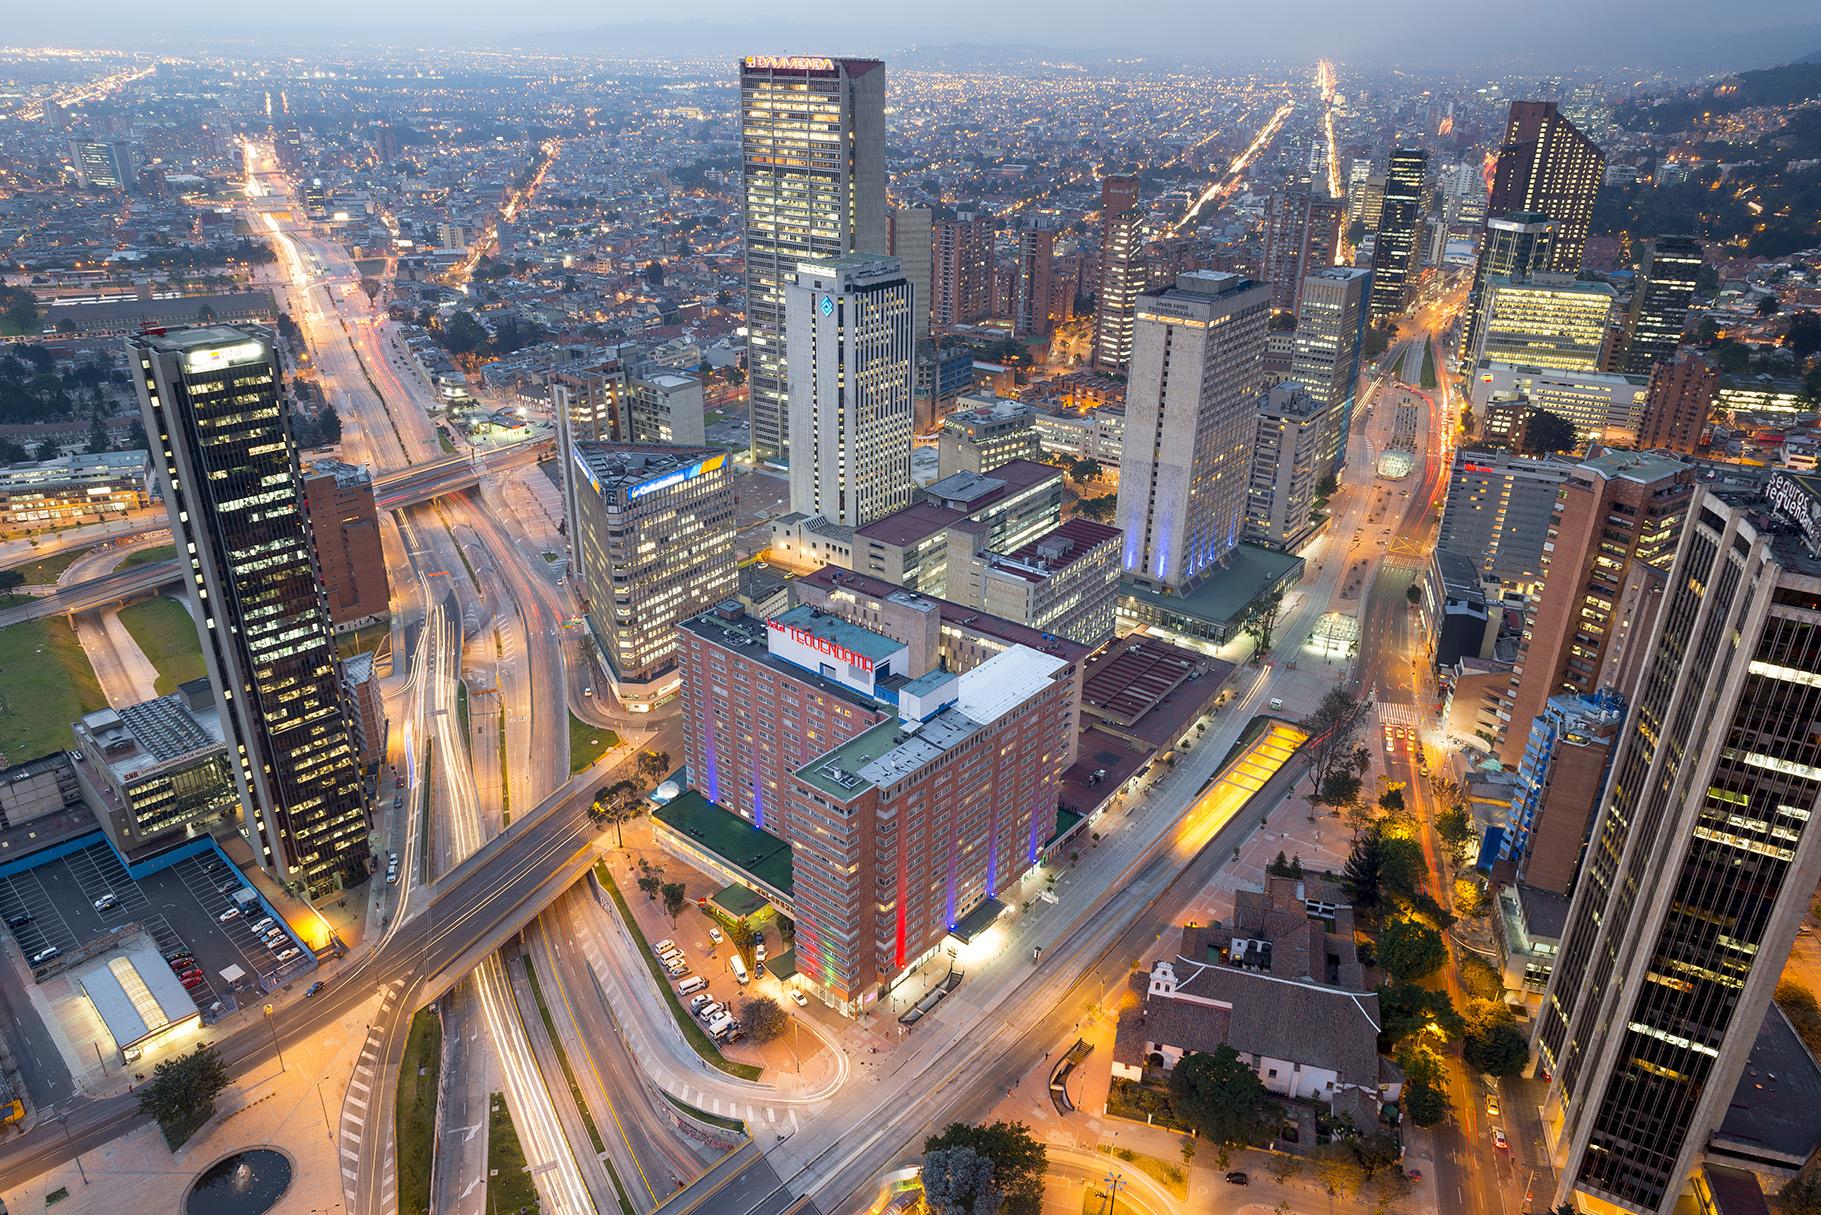 Rockstart web and mobile accelerator accepting intl for Barrio ciudad jardin bogota